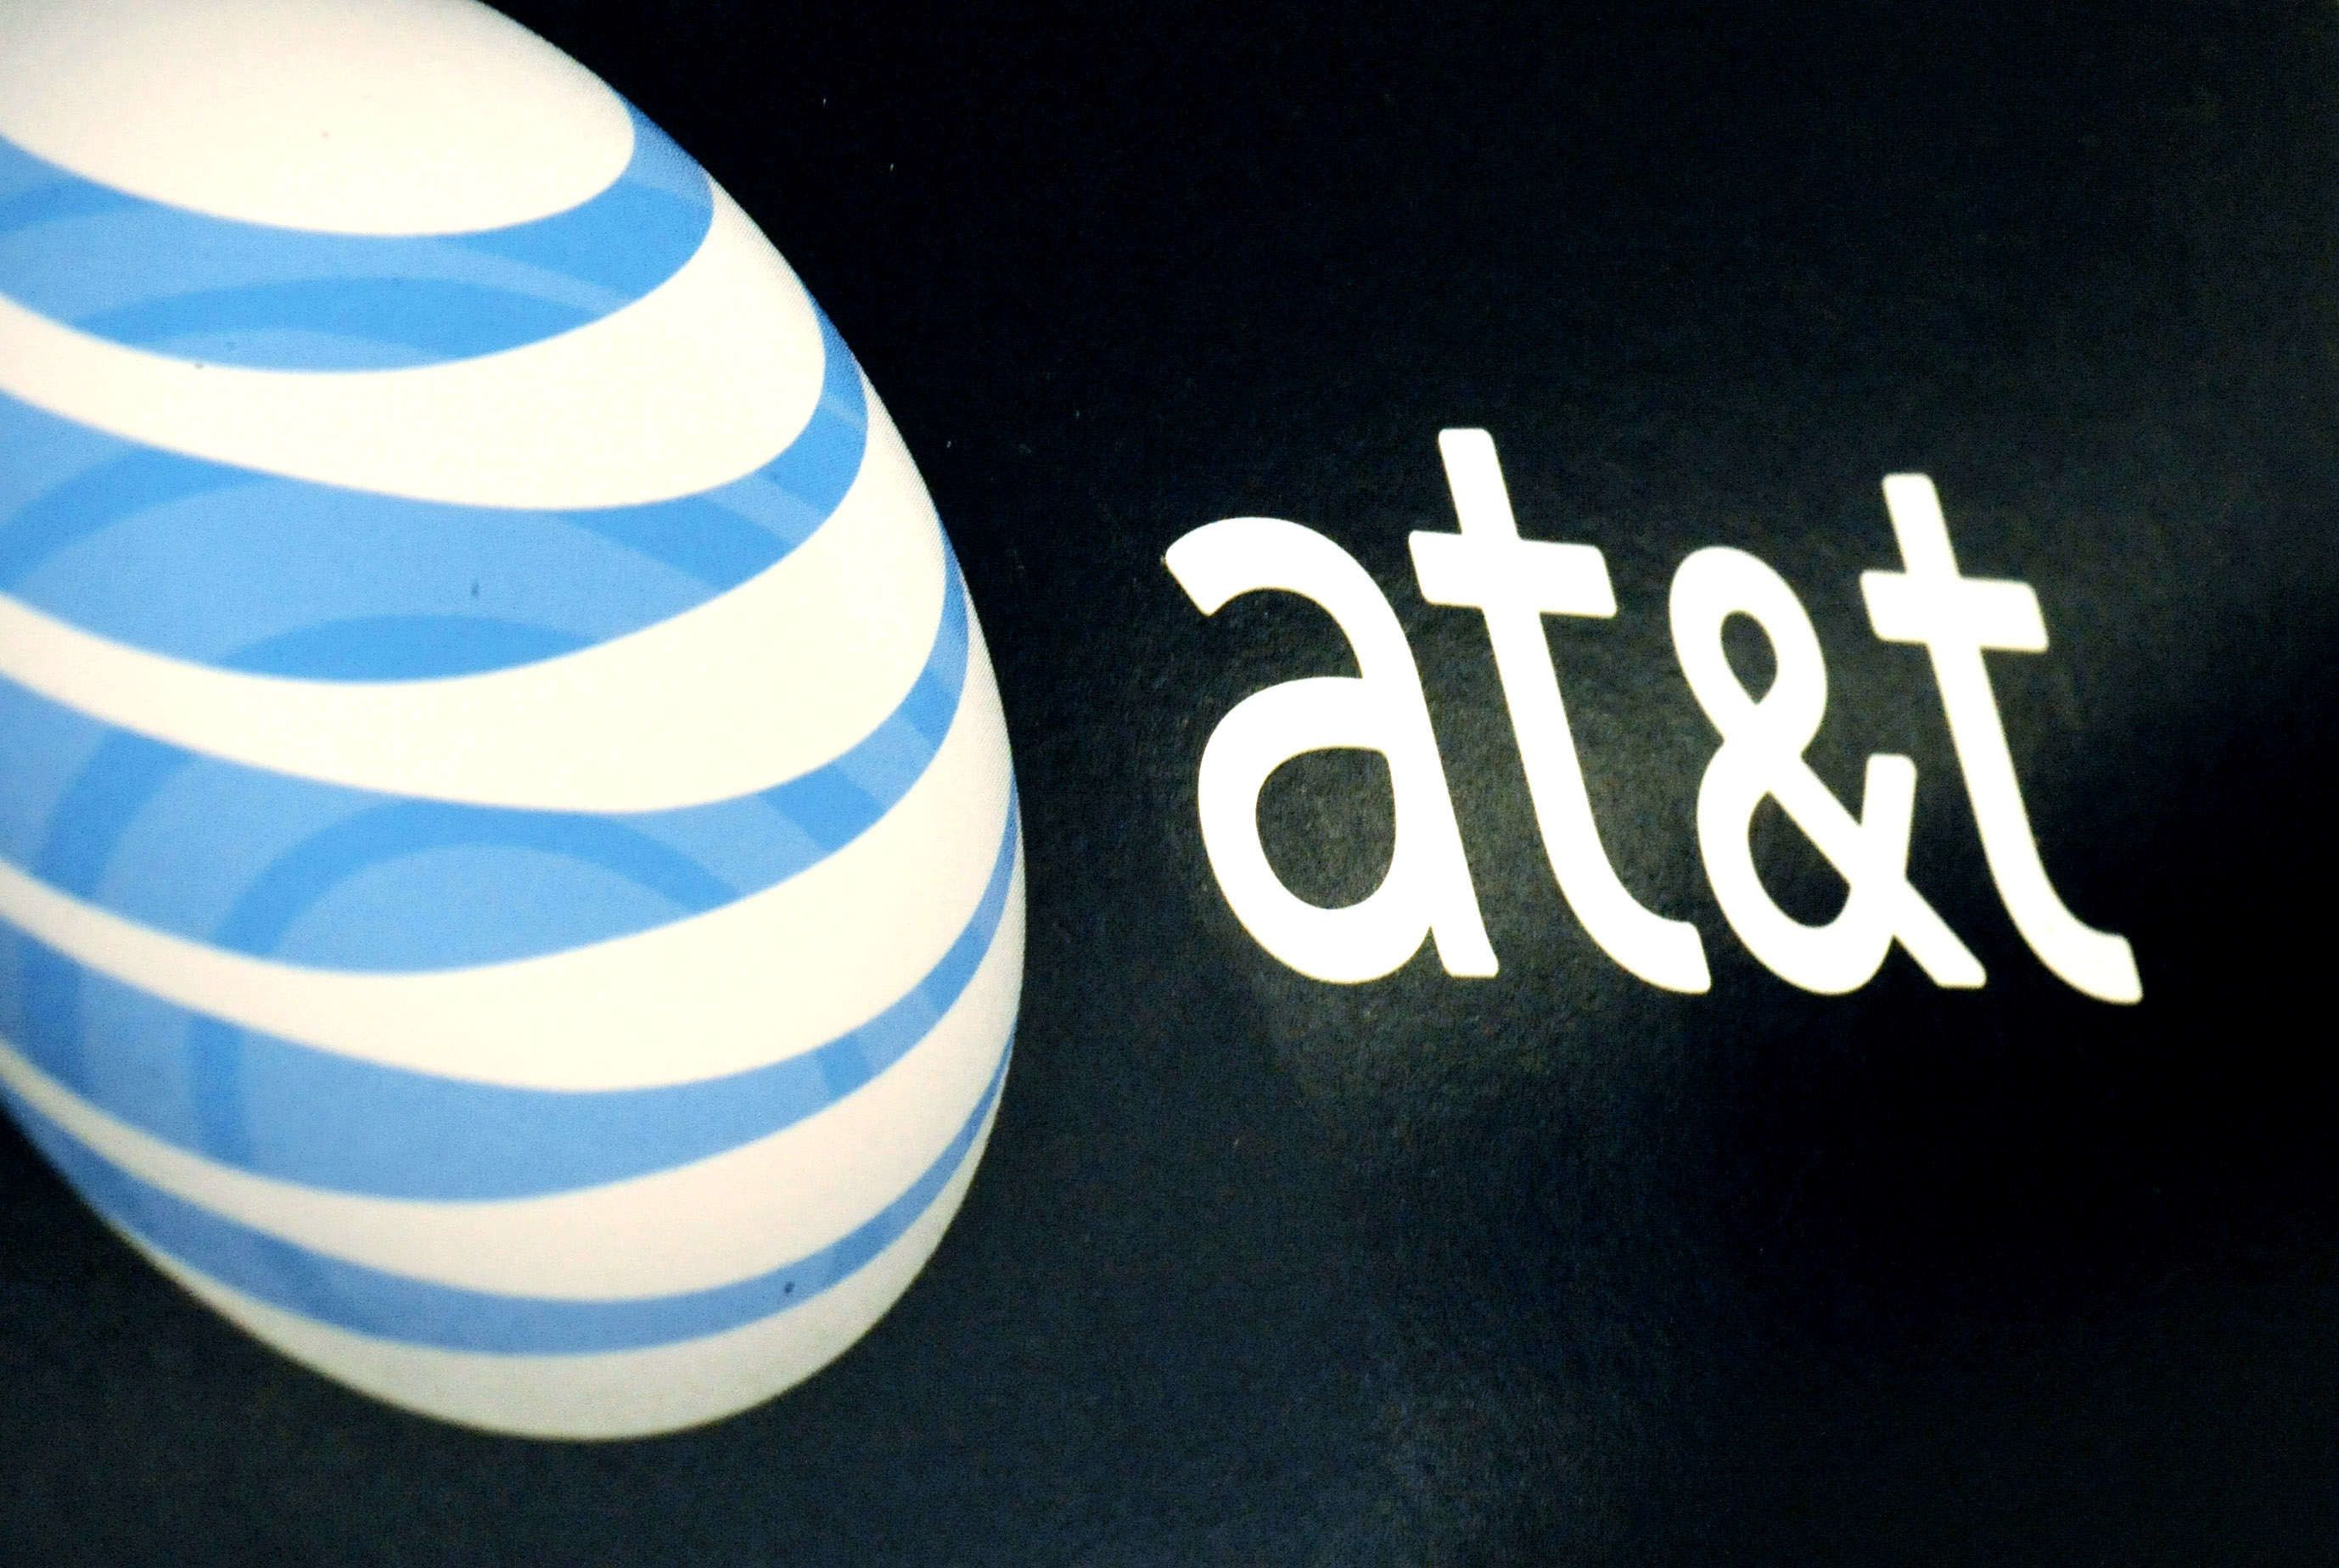 AT&T Wallpapers - Top Free AT&T